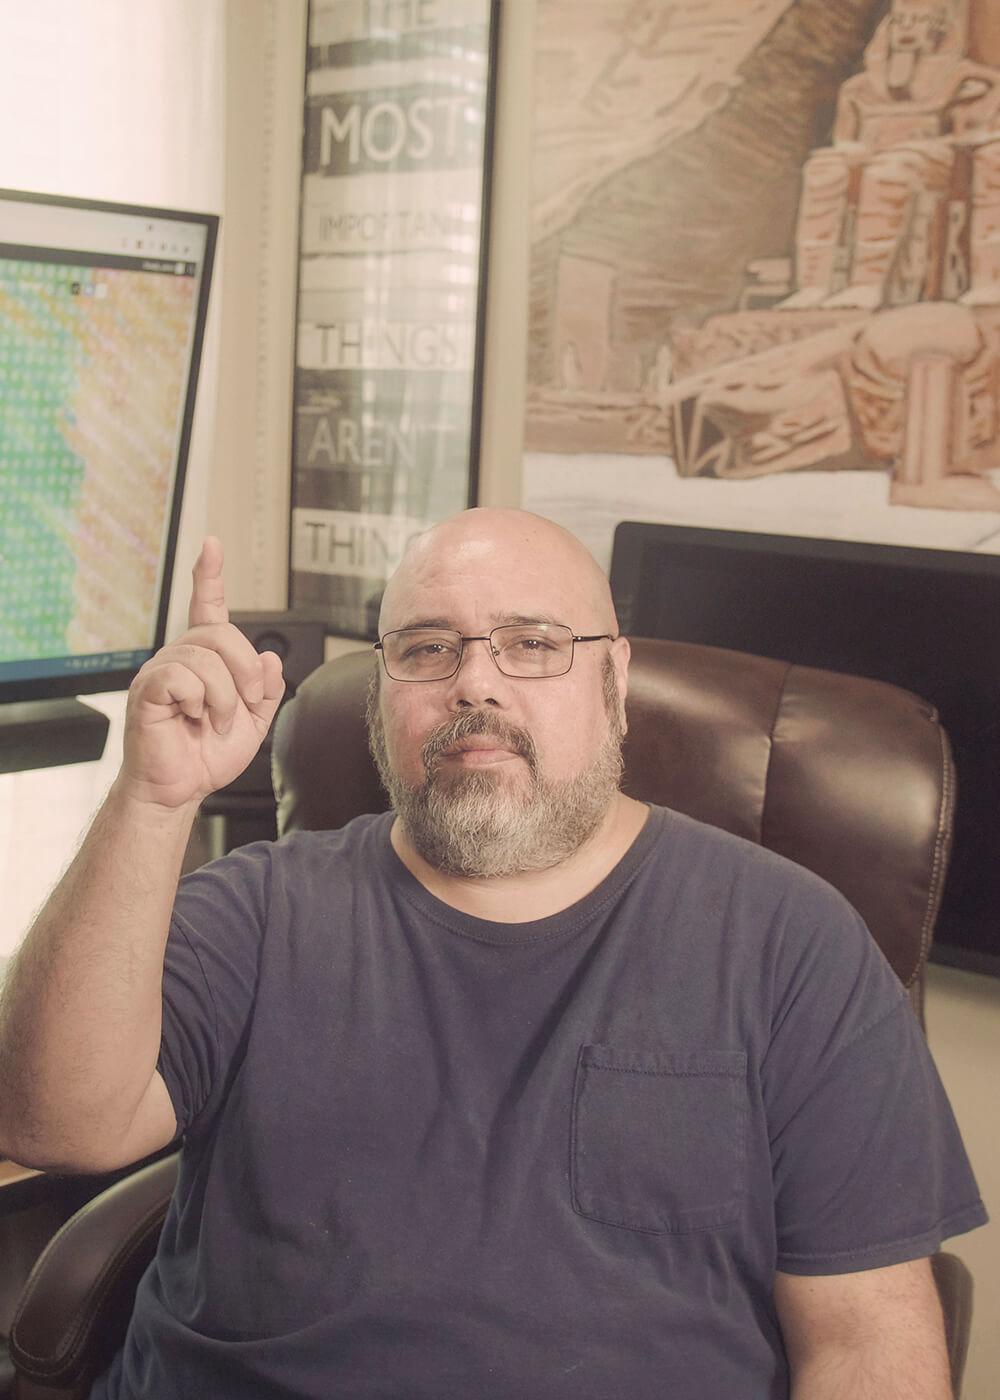 James Martinez - Aswan NFT - Pointing Up To God